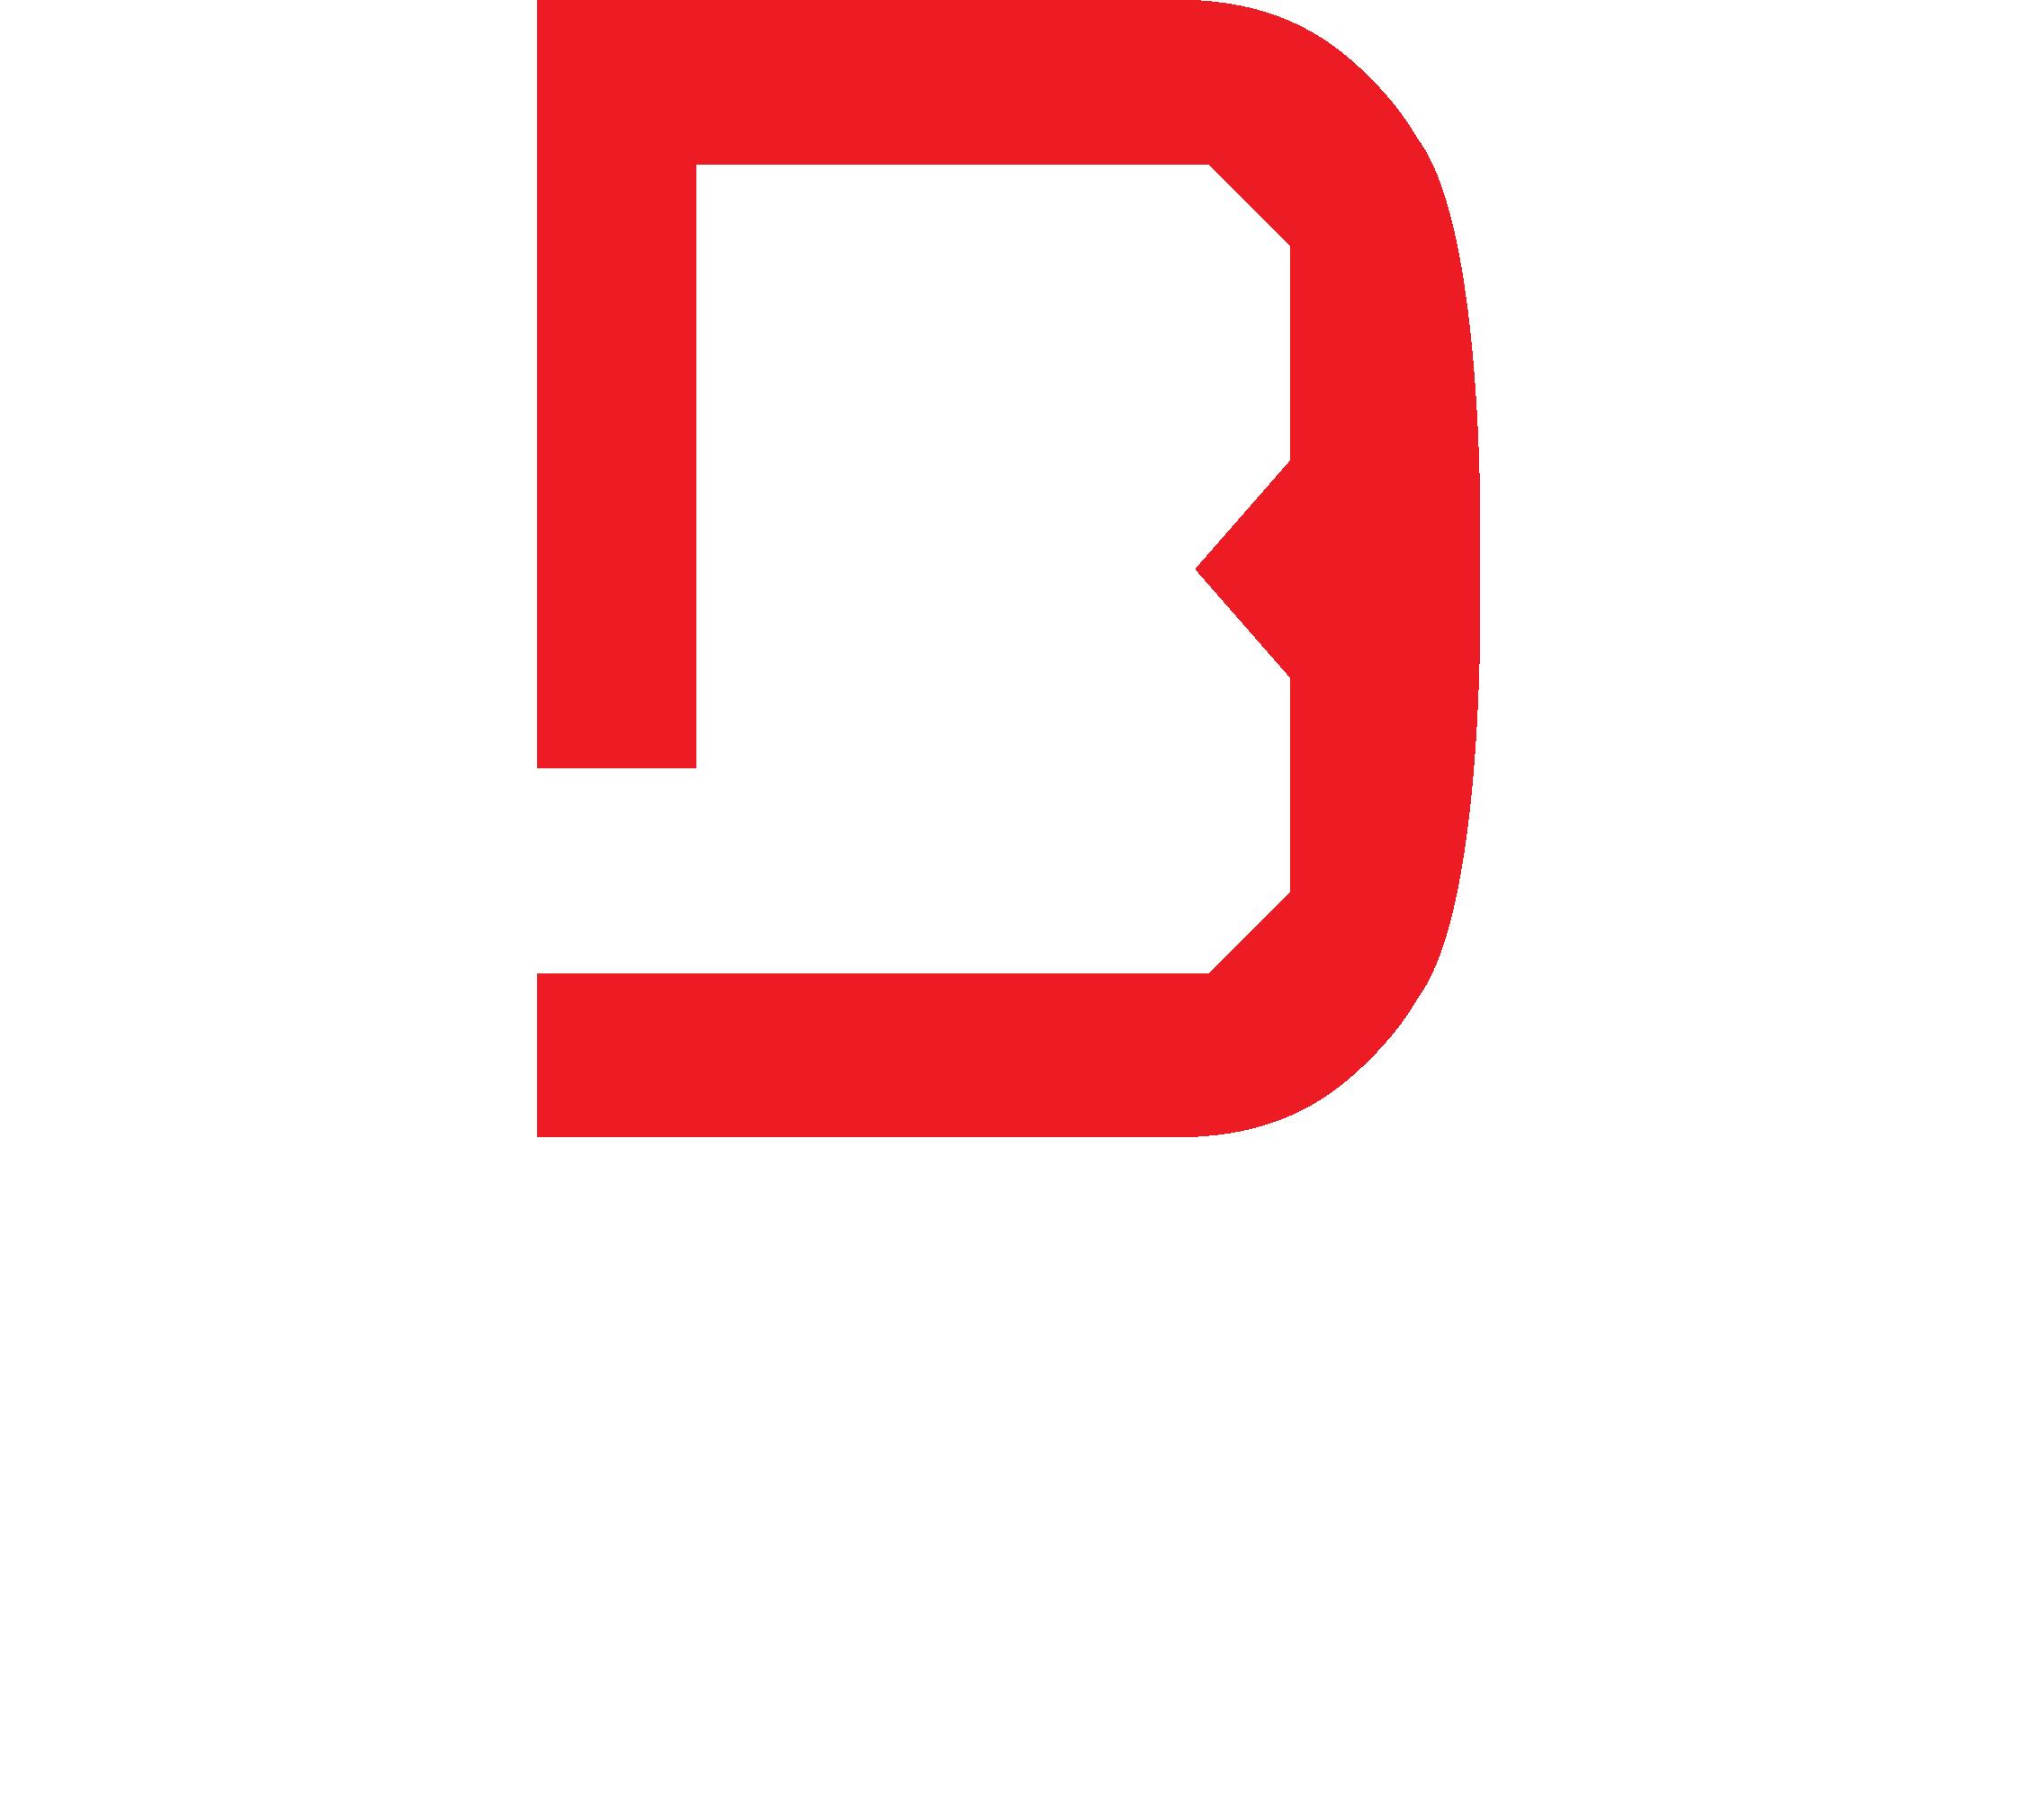 Digibayanihan